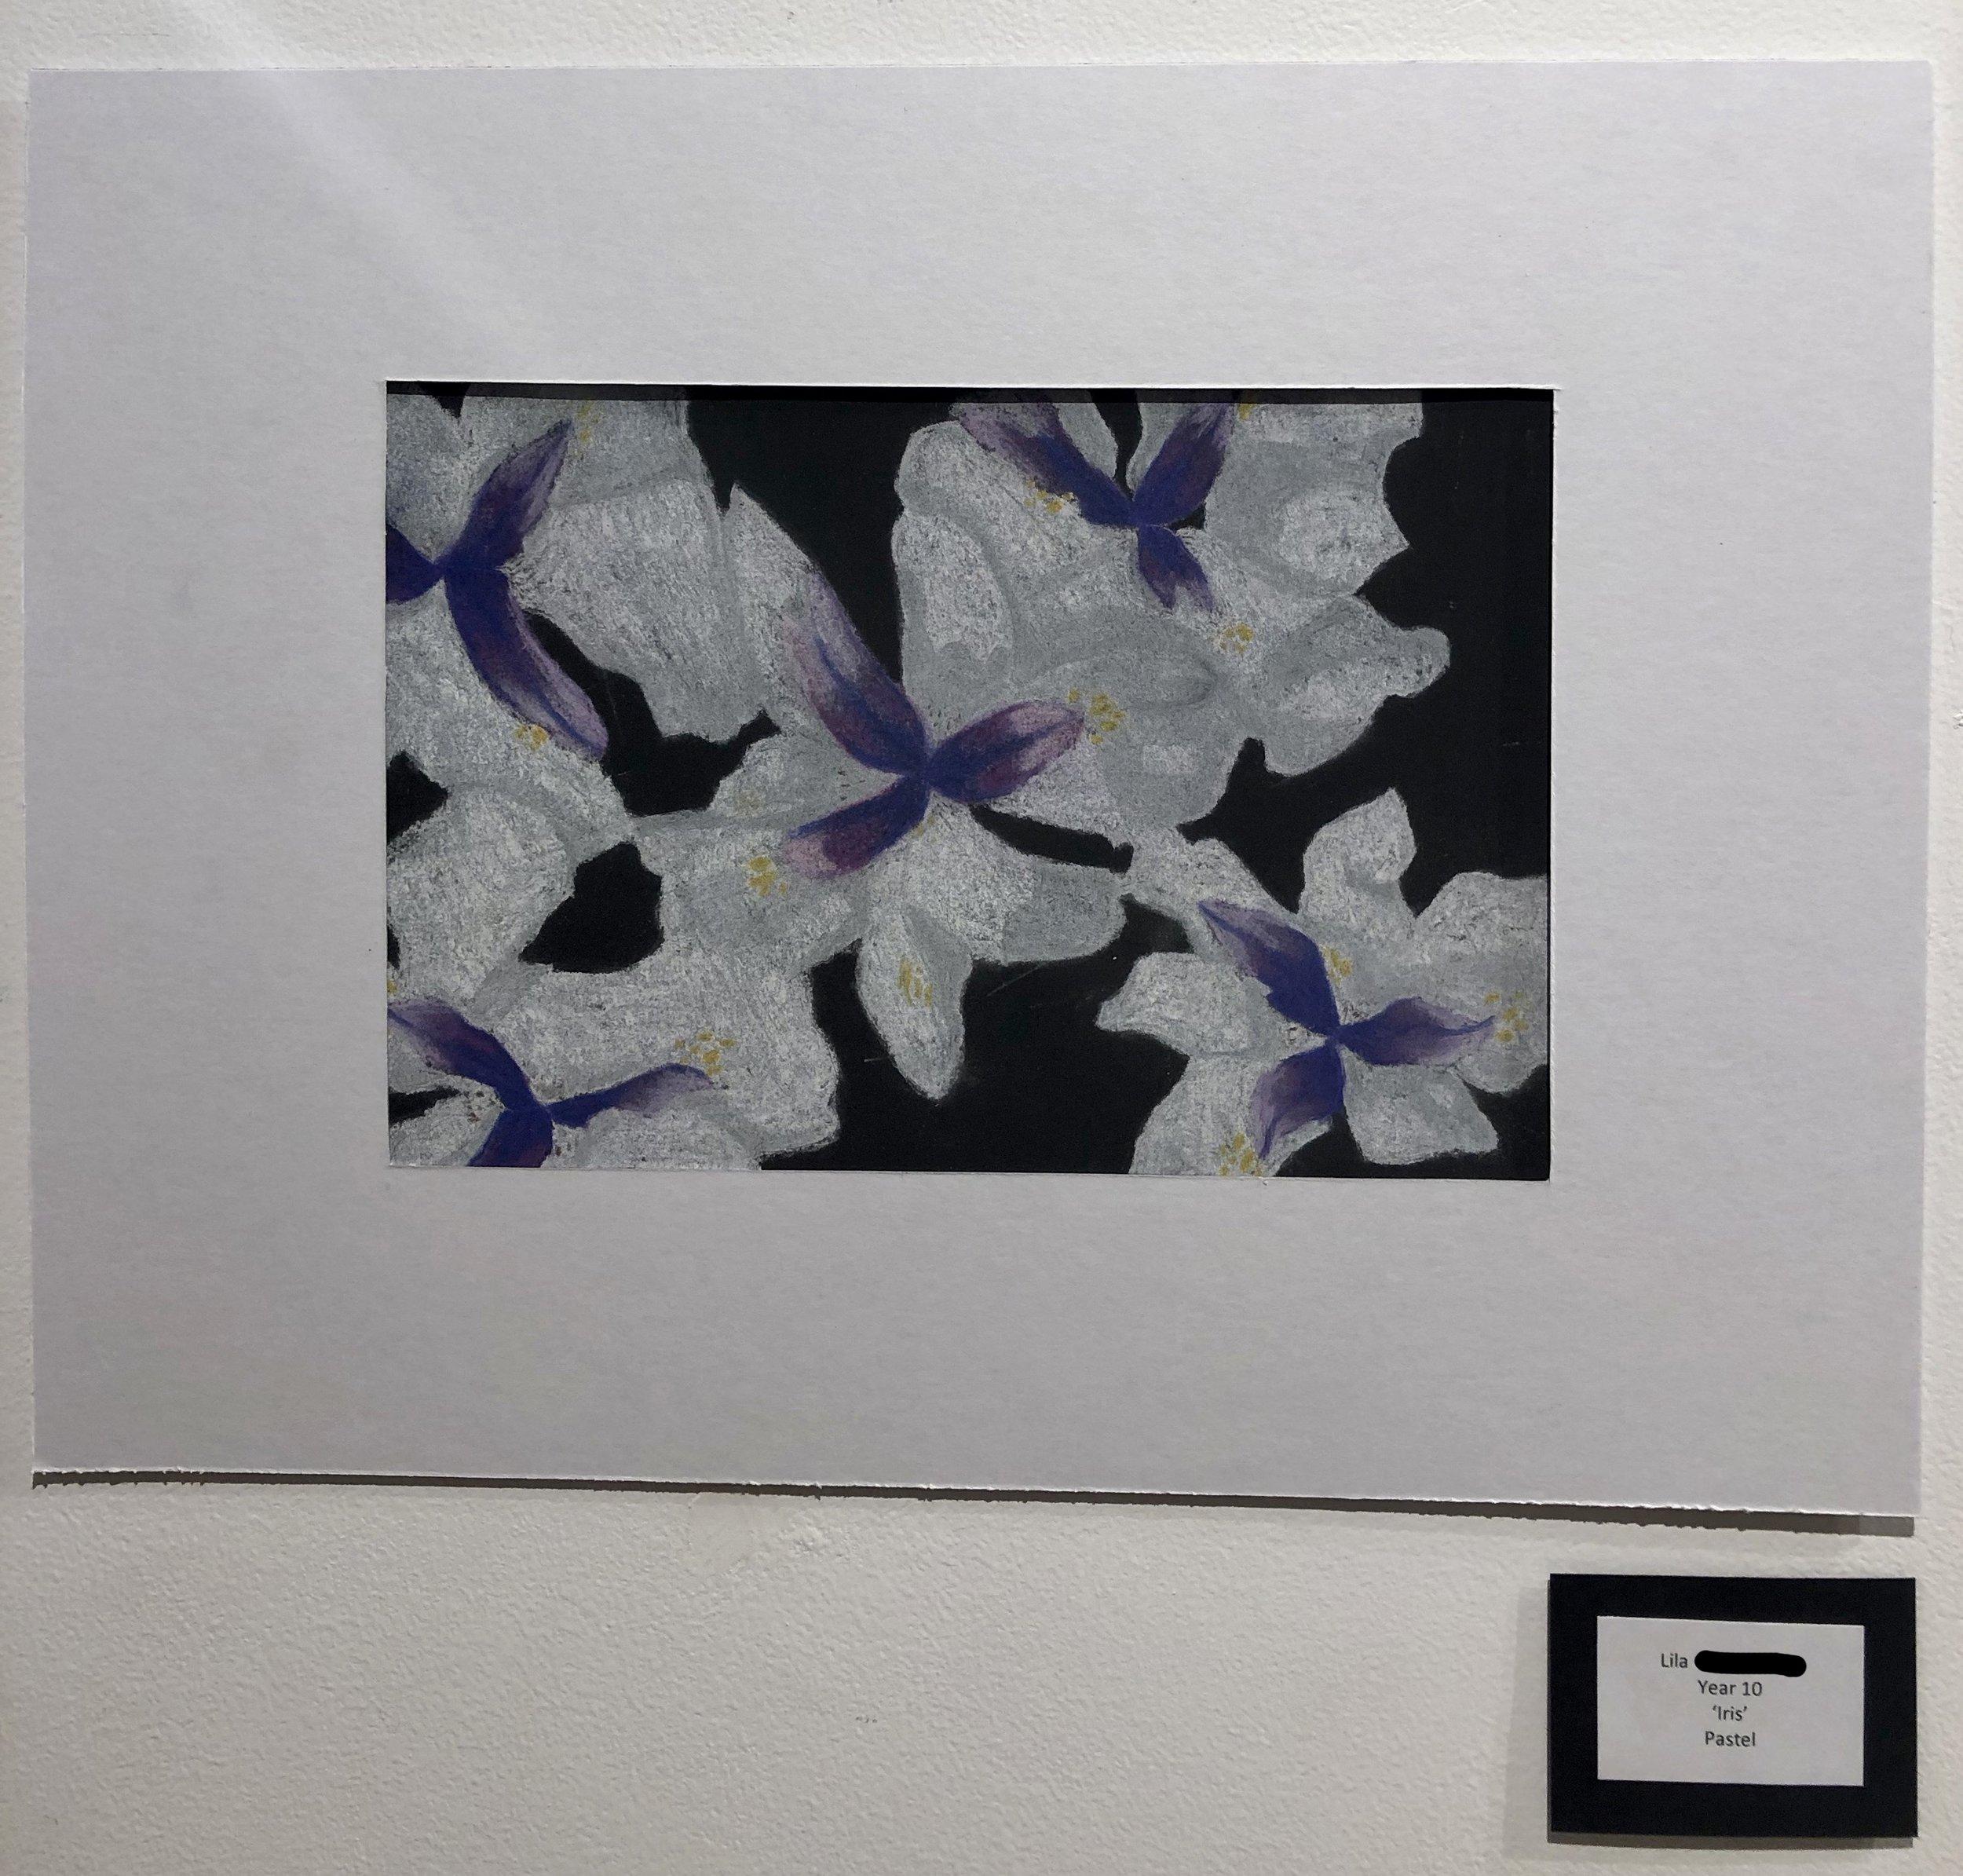 """Iris"" by Lila (Year 11)"